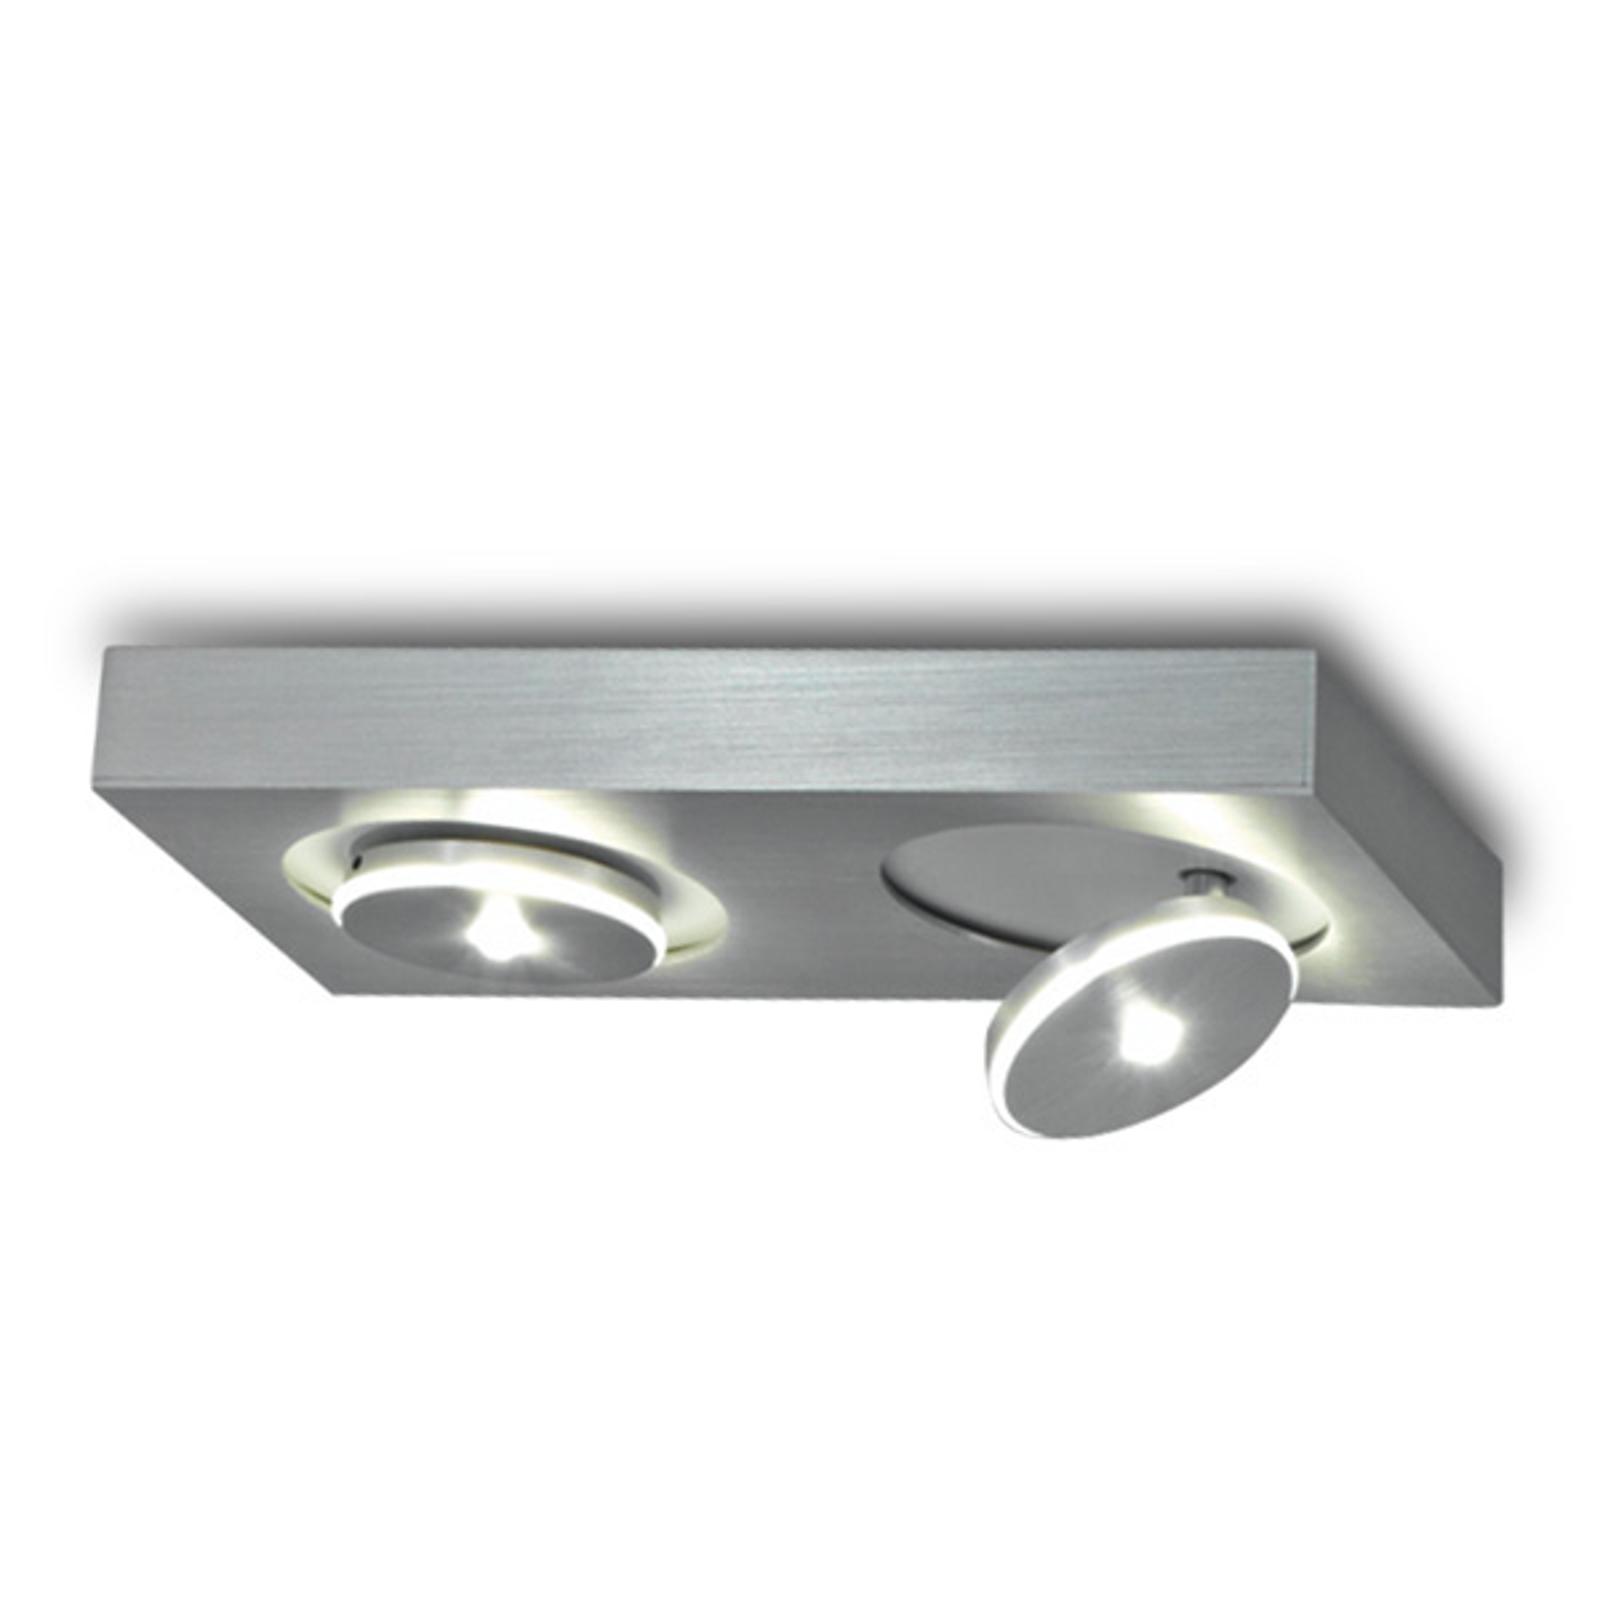 Escale Spot It - modern LED-taklampa, 2 lampor